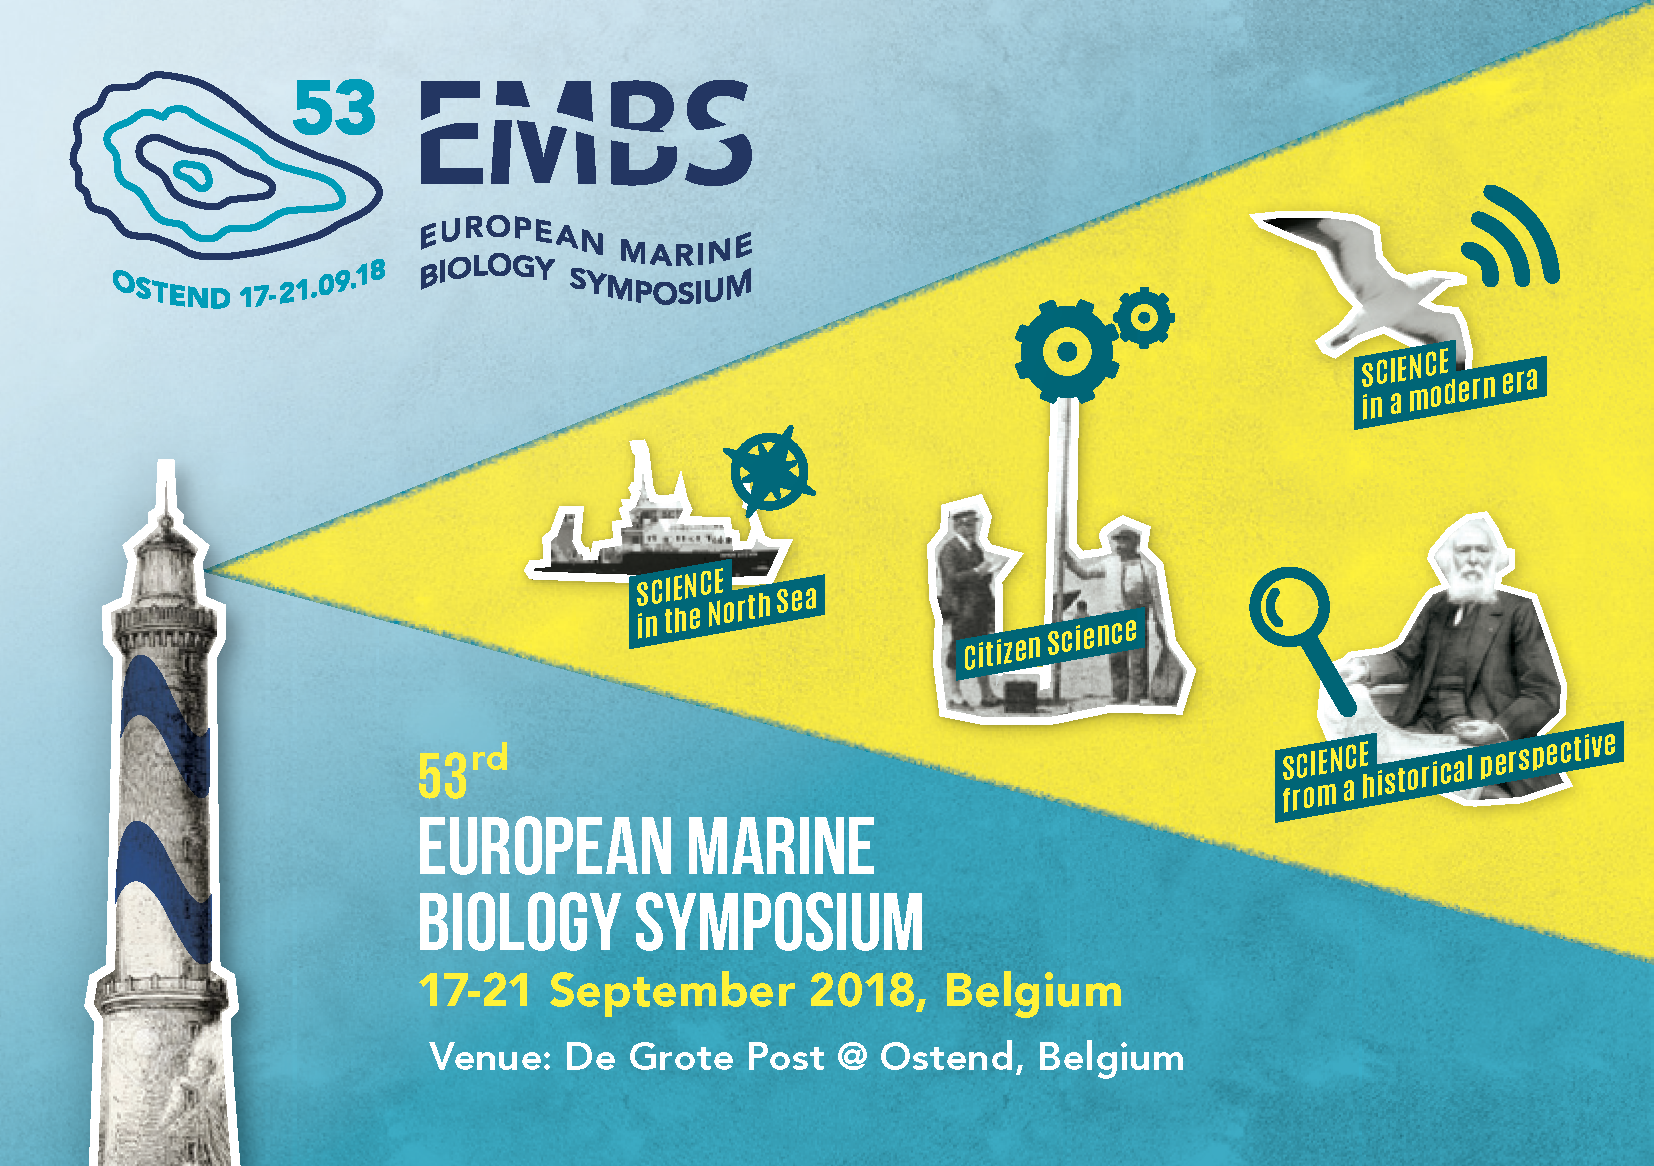 EMBS 53: Belgium, 17-21 September 2018